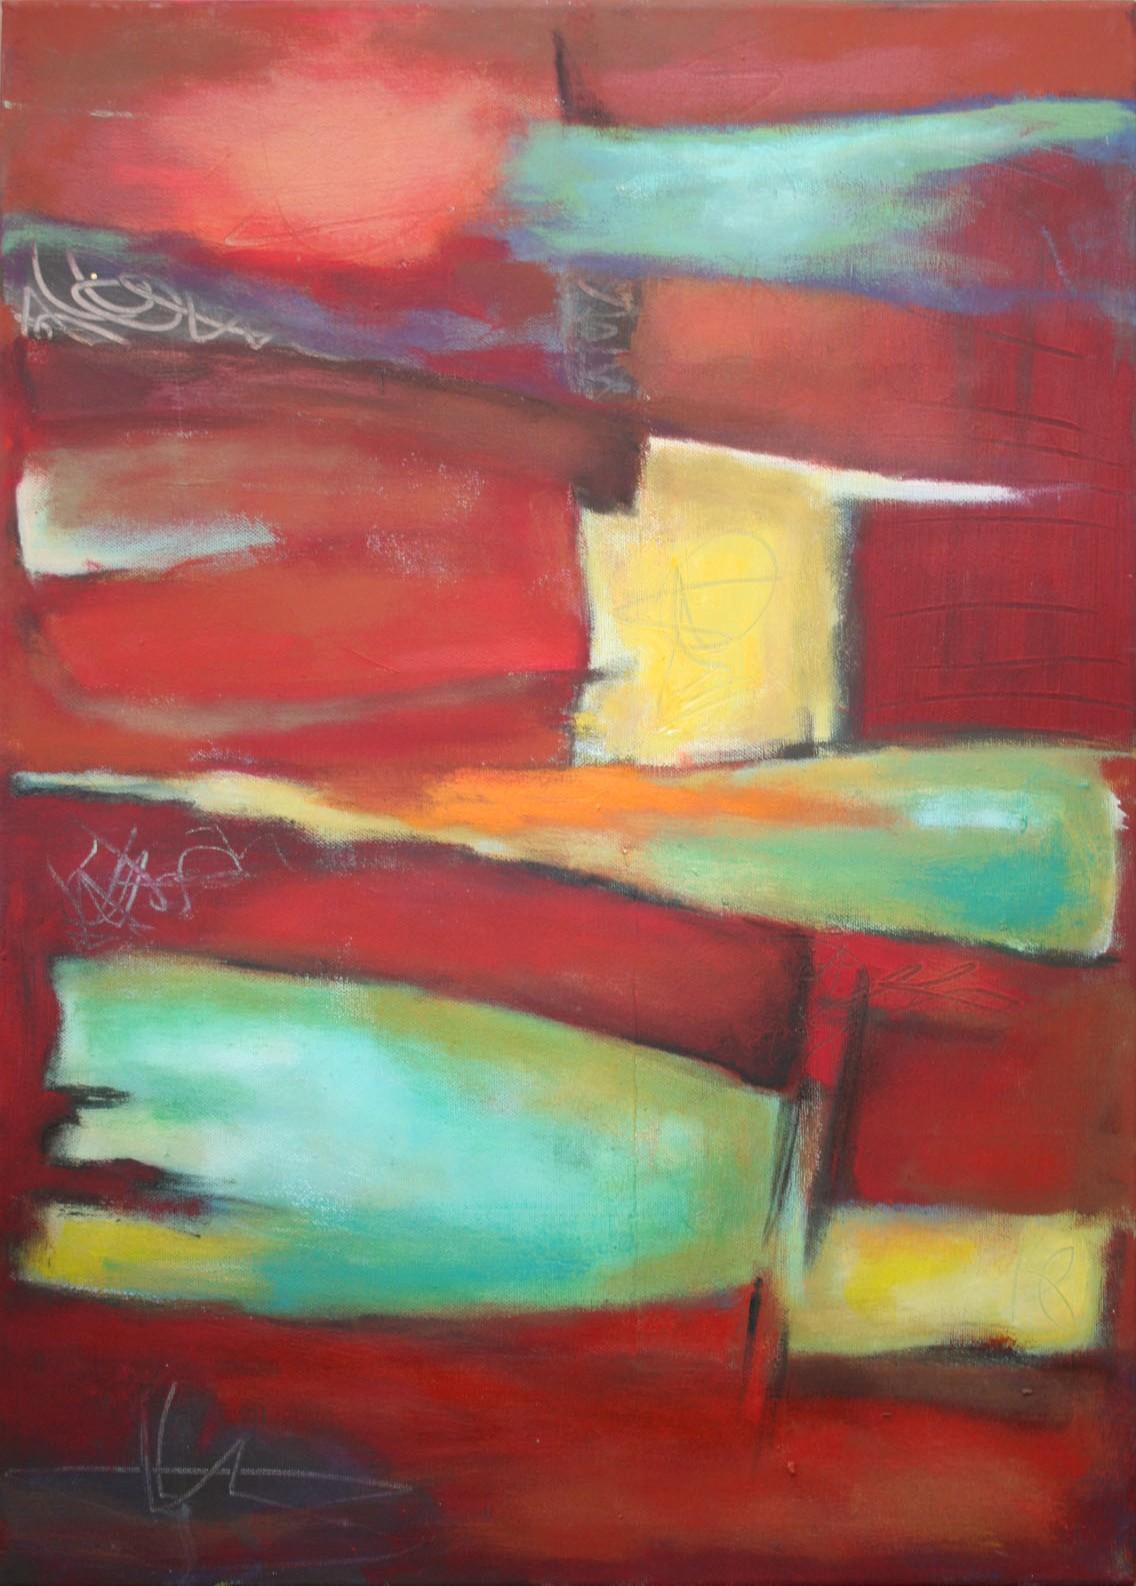 Tief im Rot III,  Öl und Acryl auf Leinwand, 70 x 50 cm